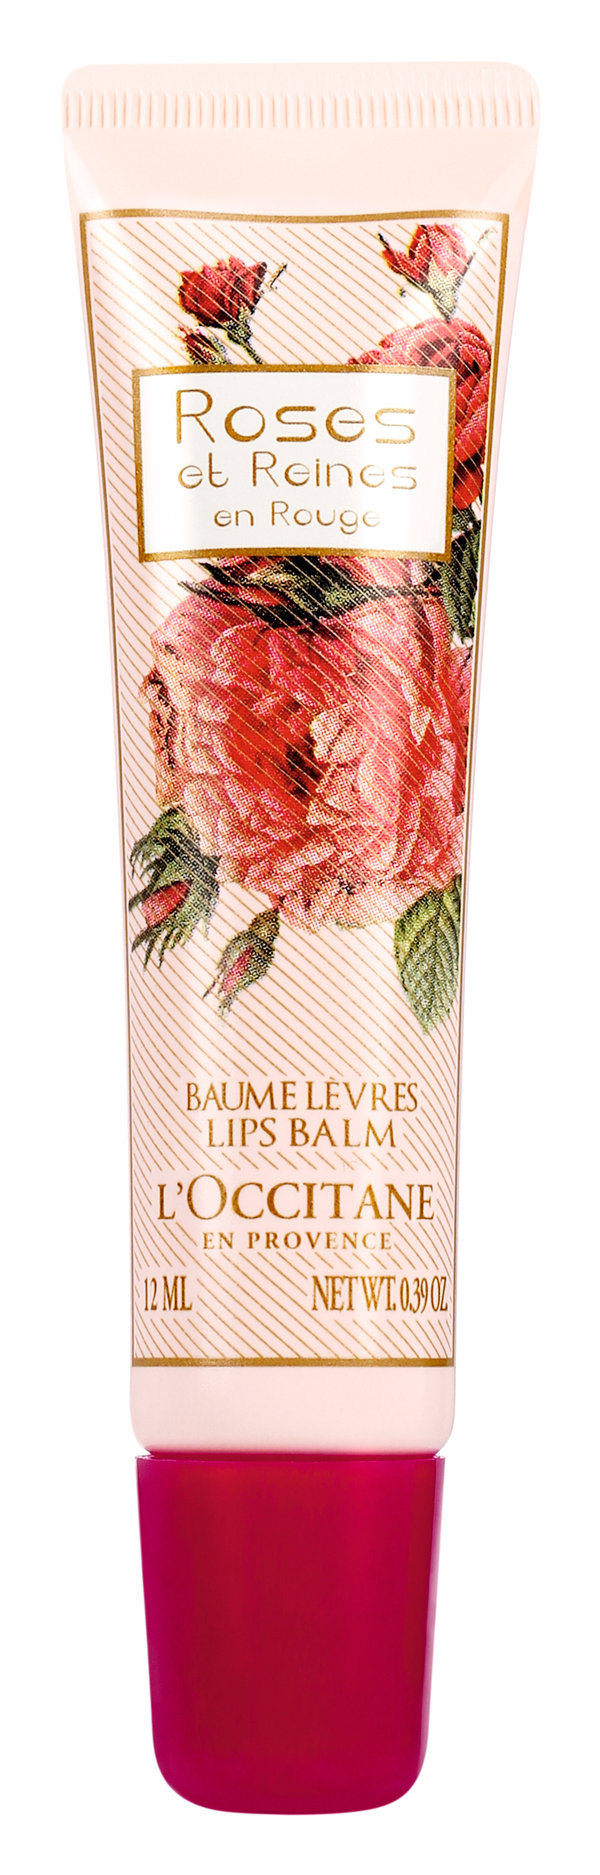 L'OCCITANE誌愛玫瑰護唇膏12ml  NT. 400.jpg